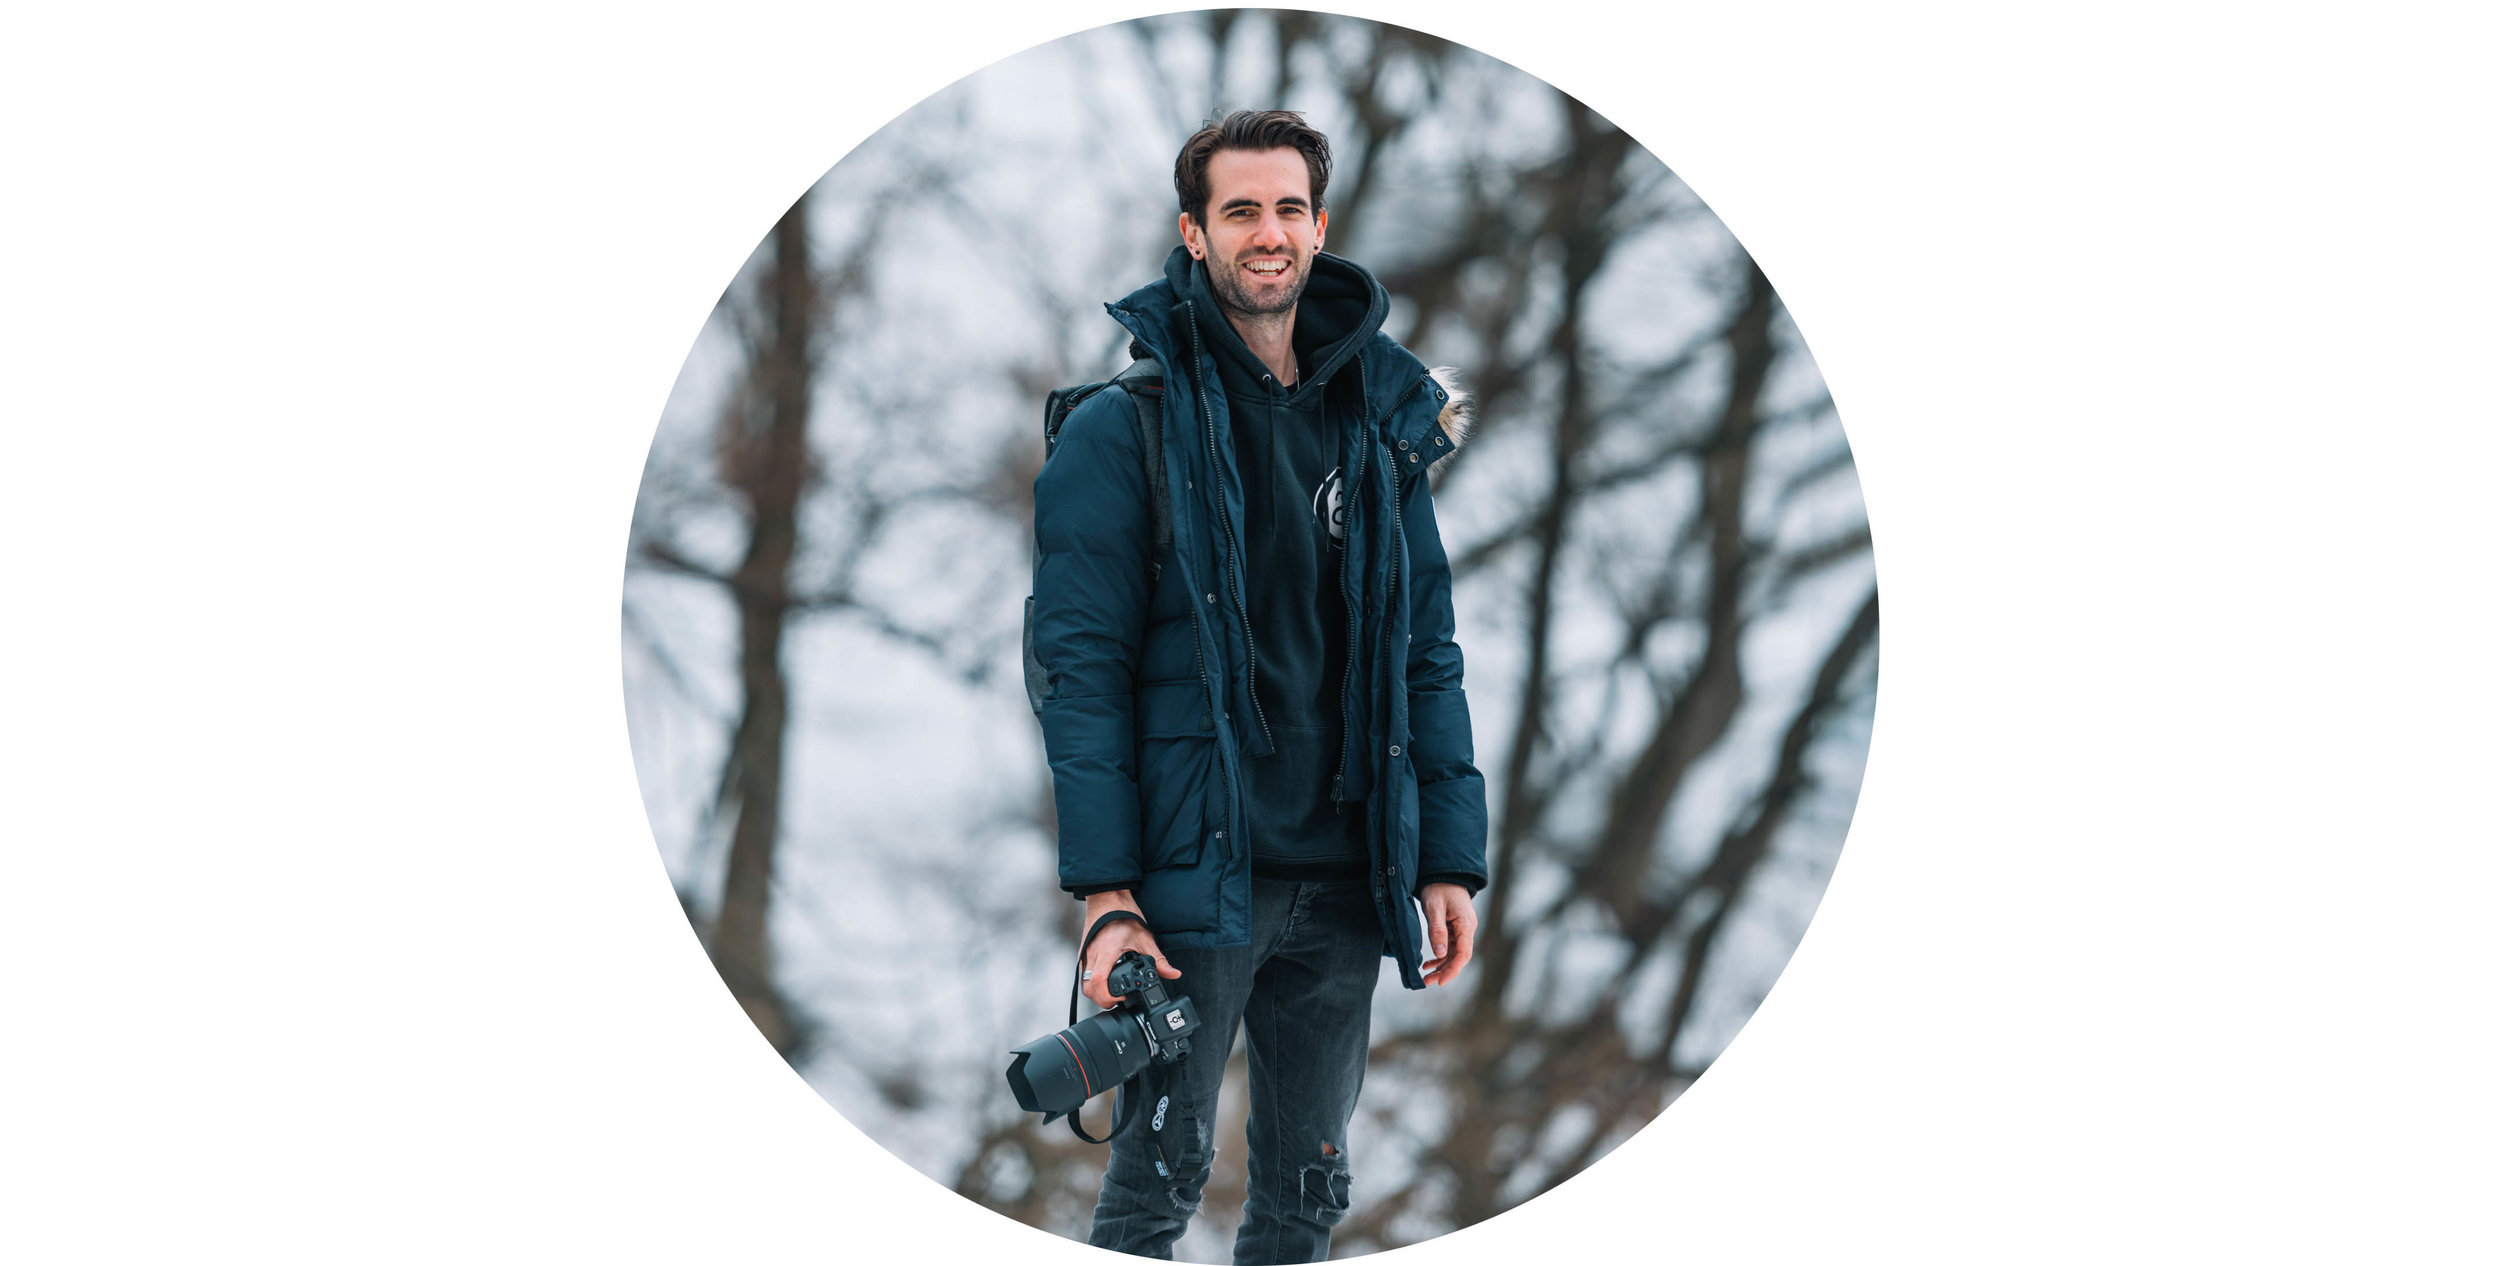 Tim Northey - Sydney Based Photographer